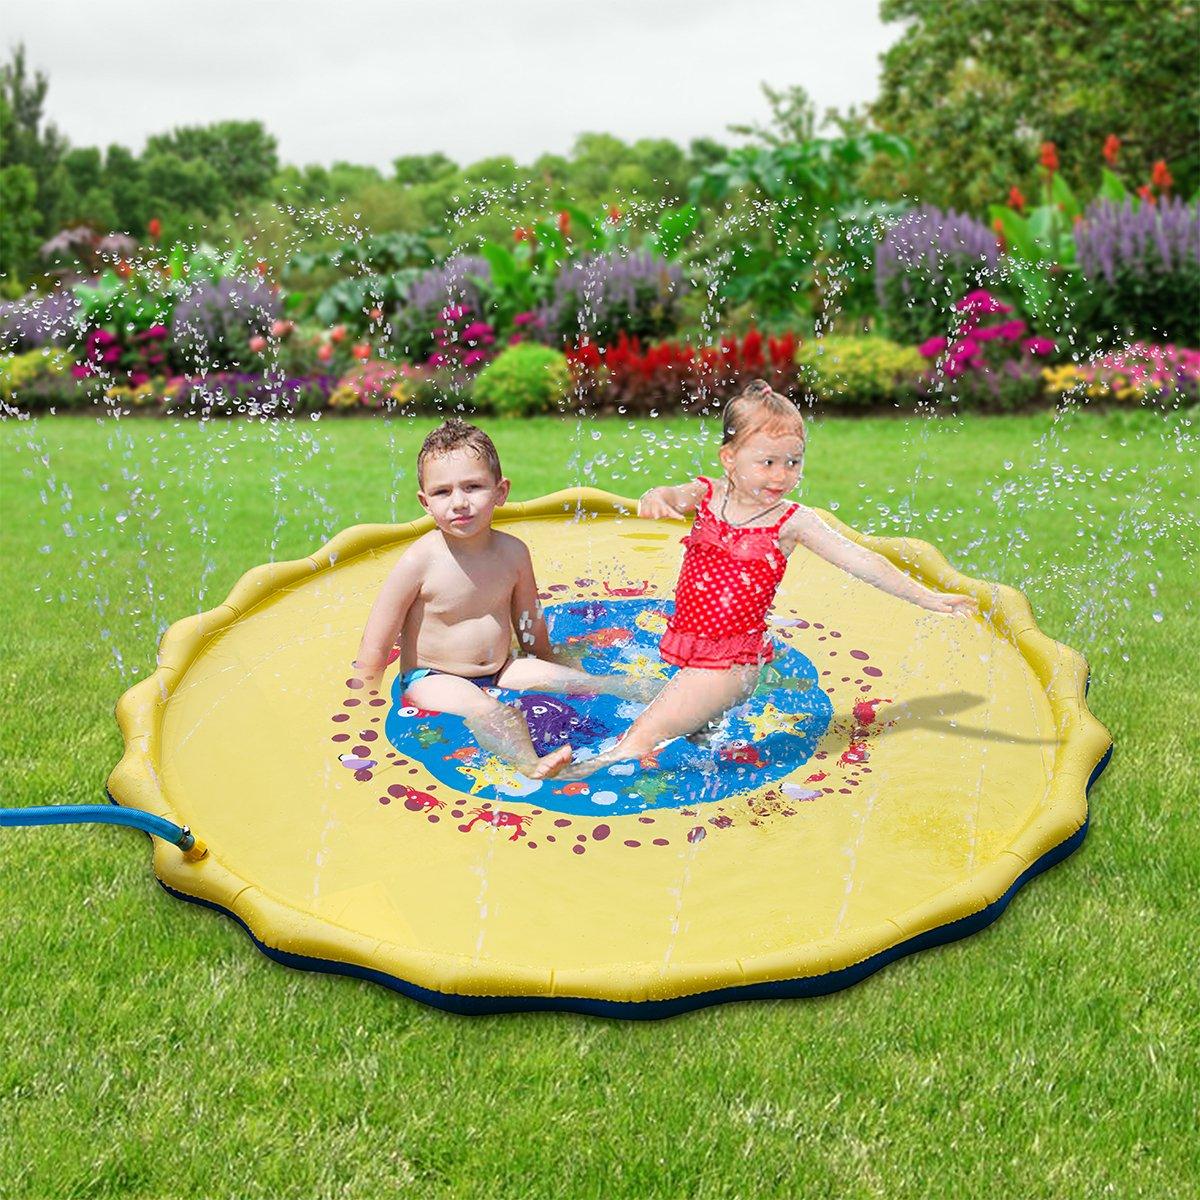 HALOFUN 67in-Diameter Sprinkle and Splash Play Mat for Kids (Yellow) by HALOFUN (Image #2)